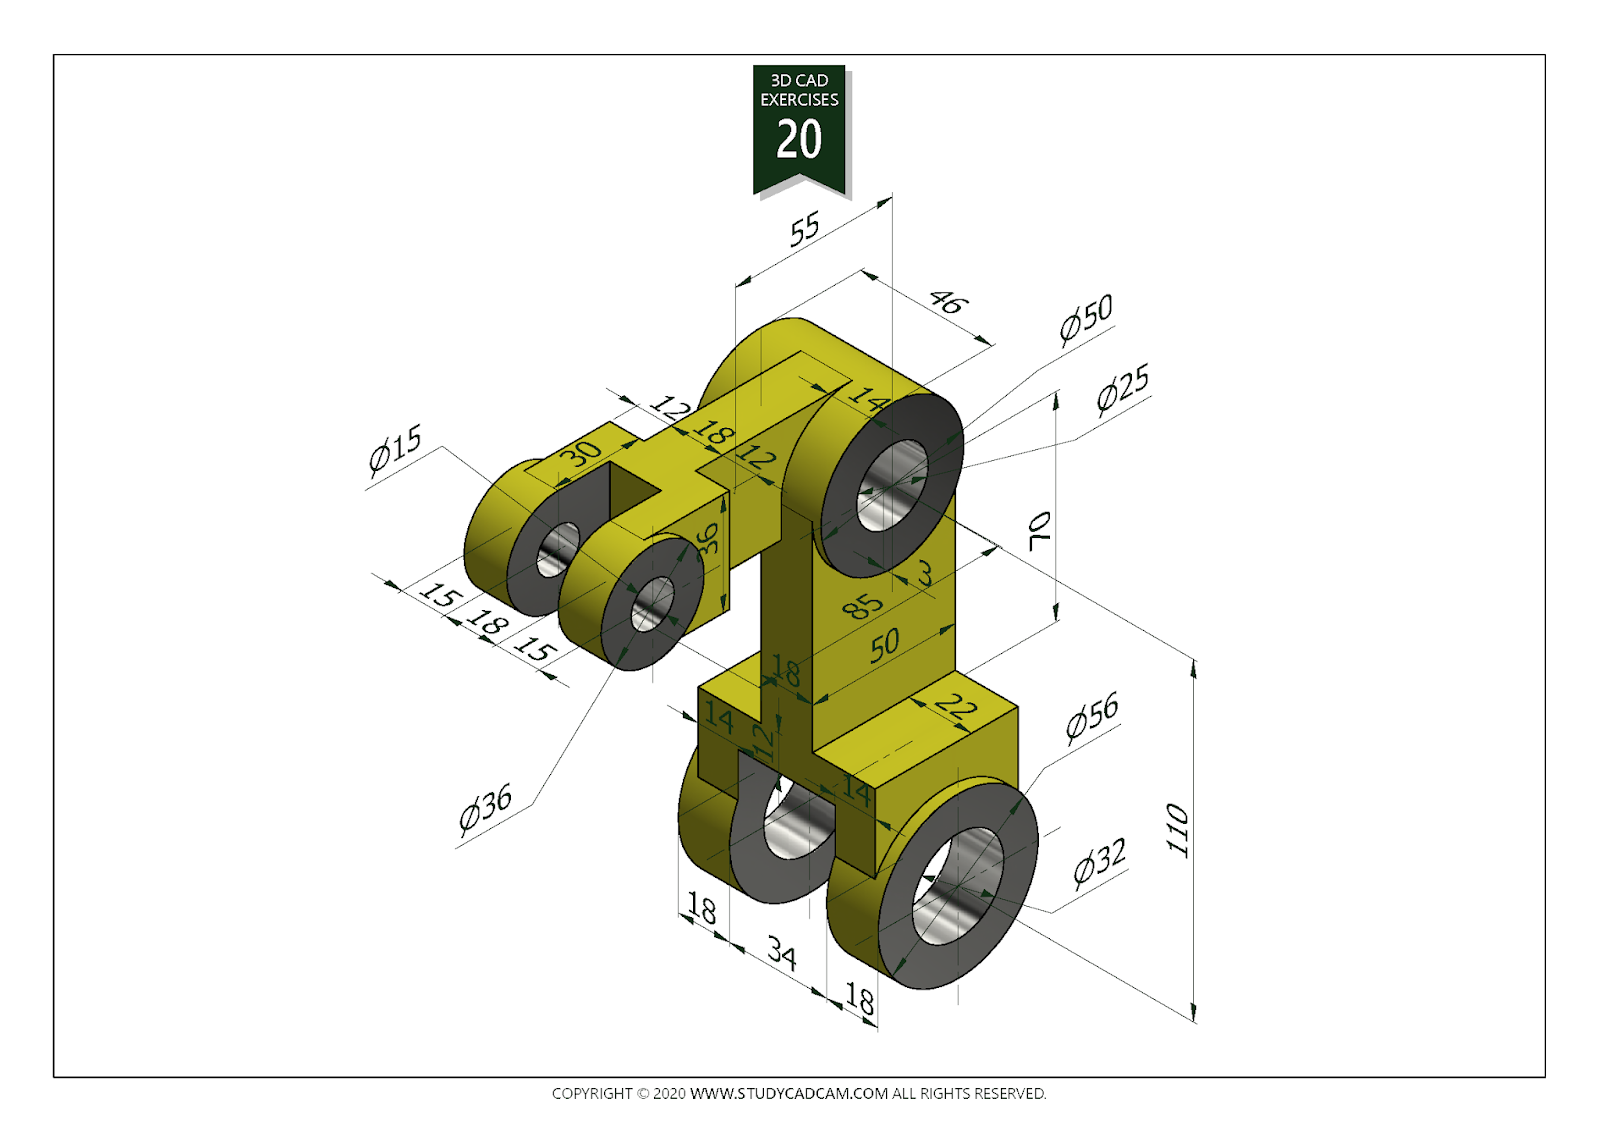 Pin On Autocad Solidworks Blender Practice Images